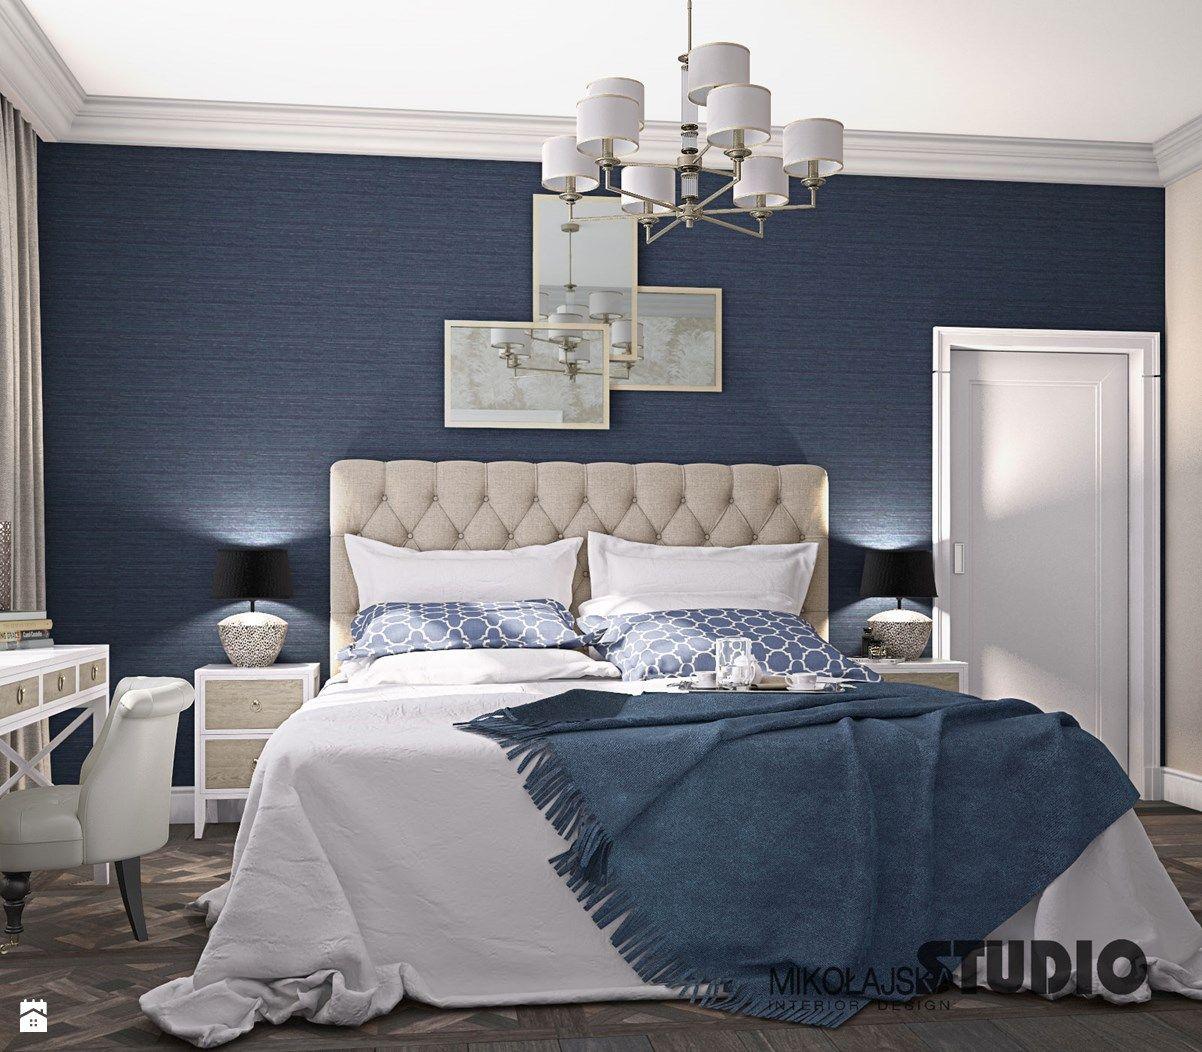 new york style bedroom zdja cie od mikoa ajskastudio sypialnia